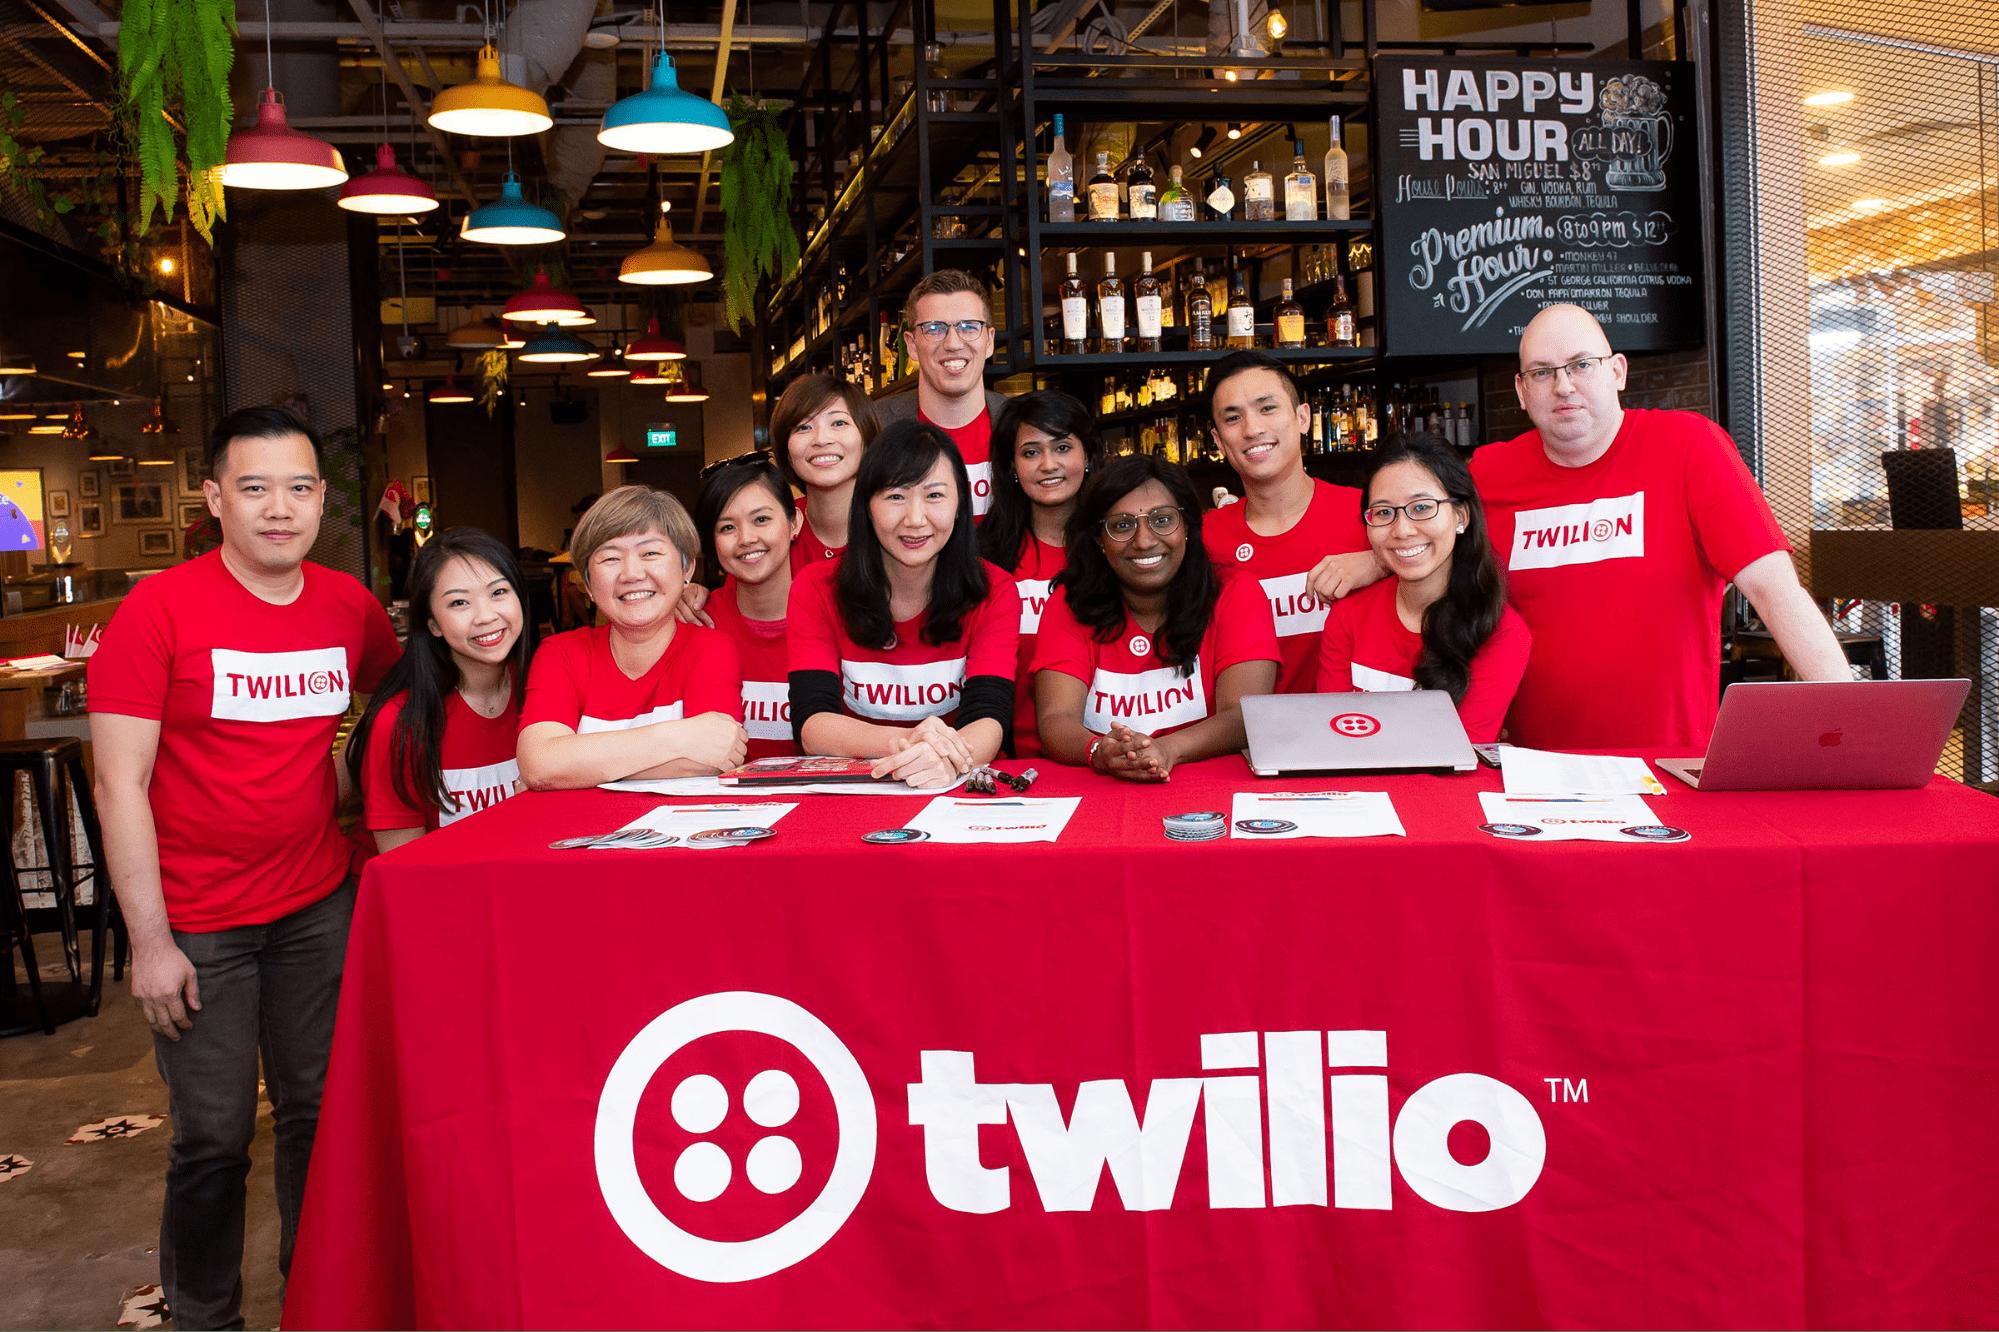 Twilio After Hours - Twilio Event Marketing